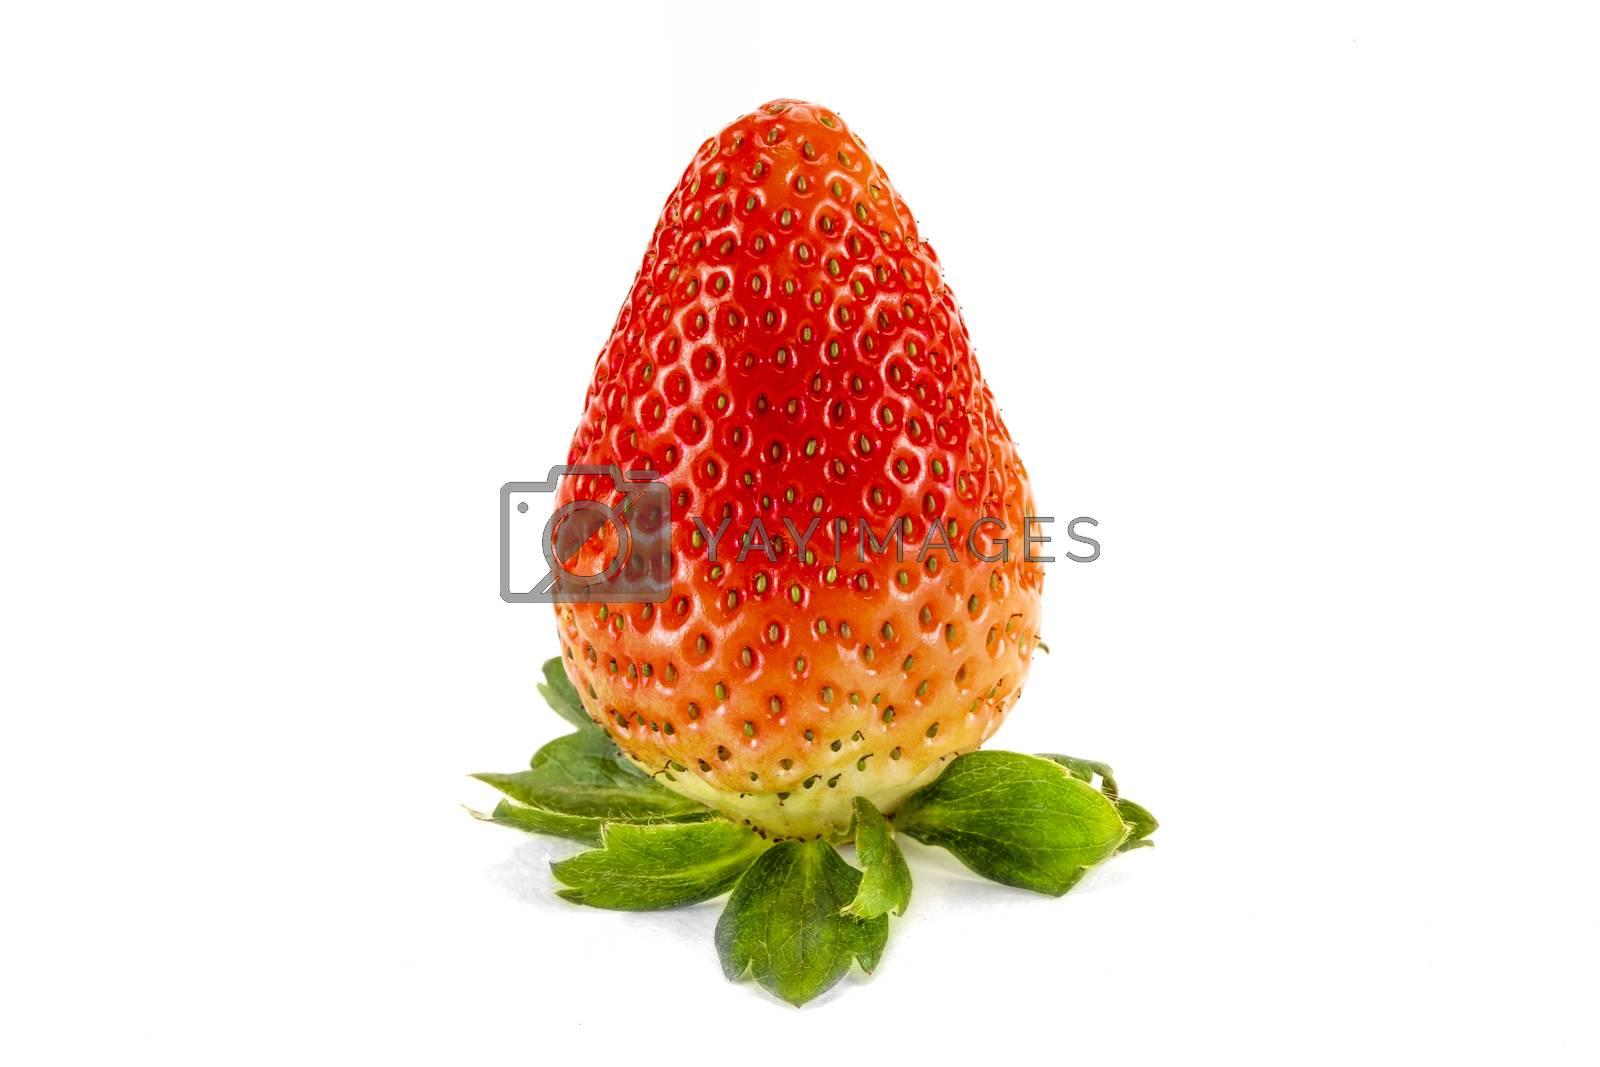 Fresh large red strawberry, isolated on white background